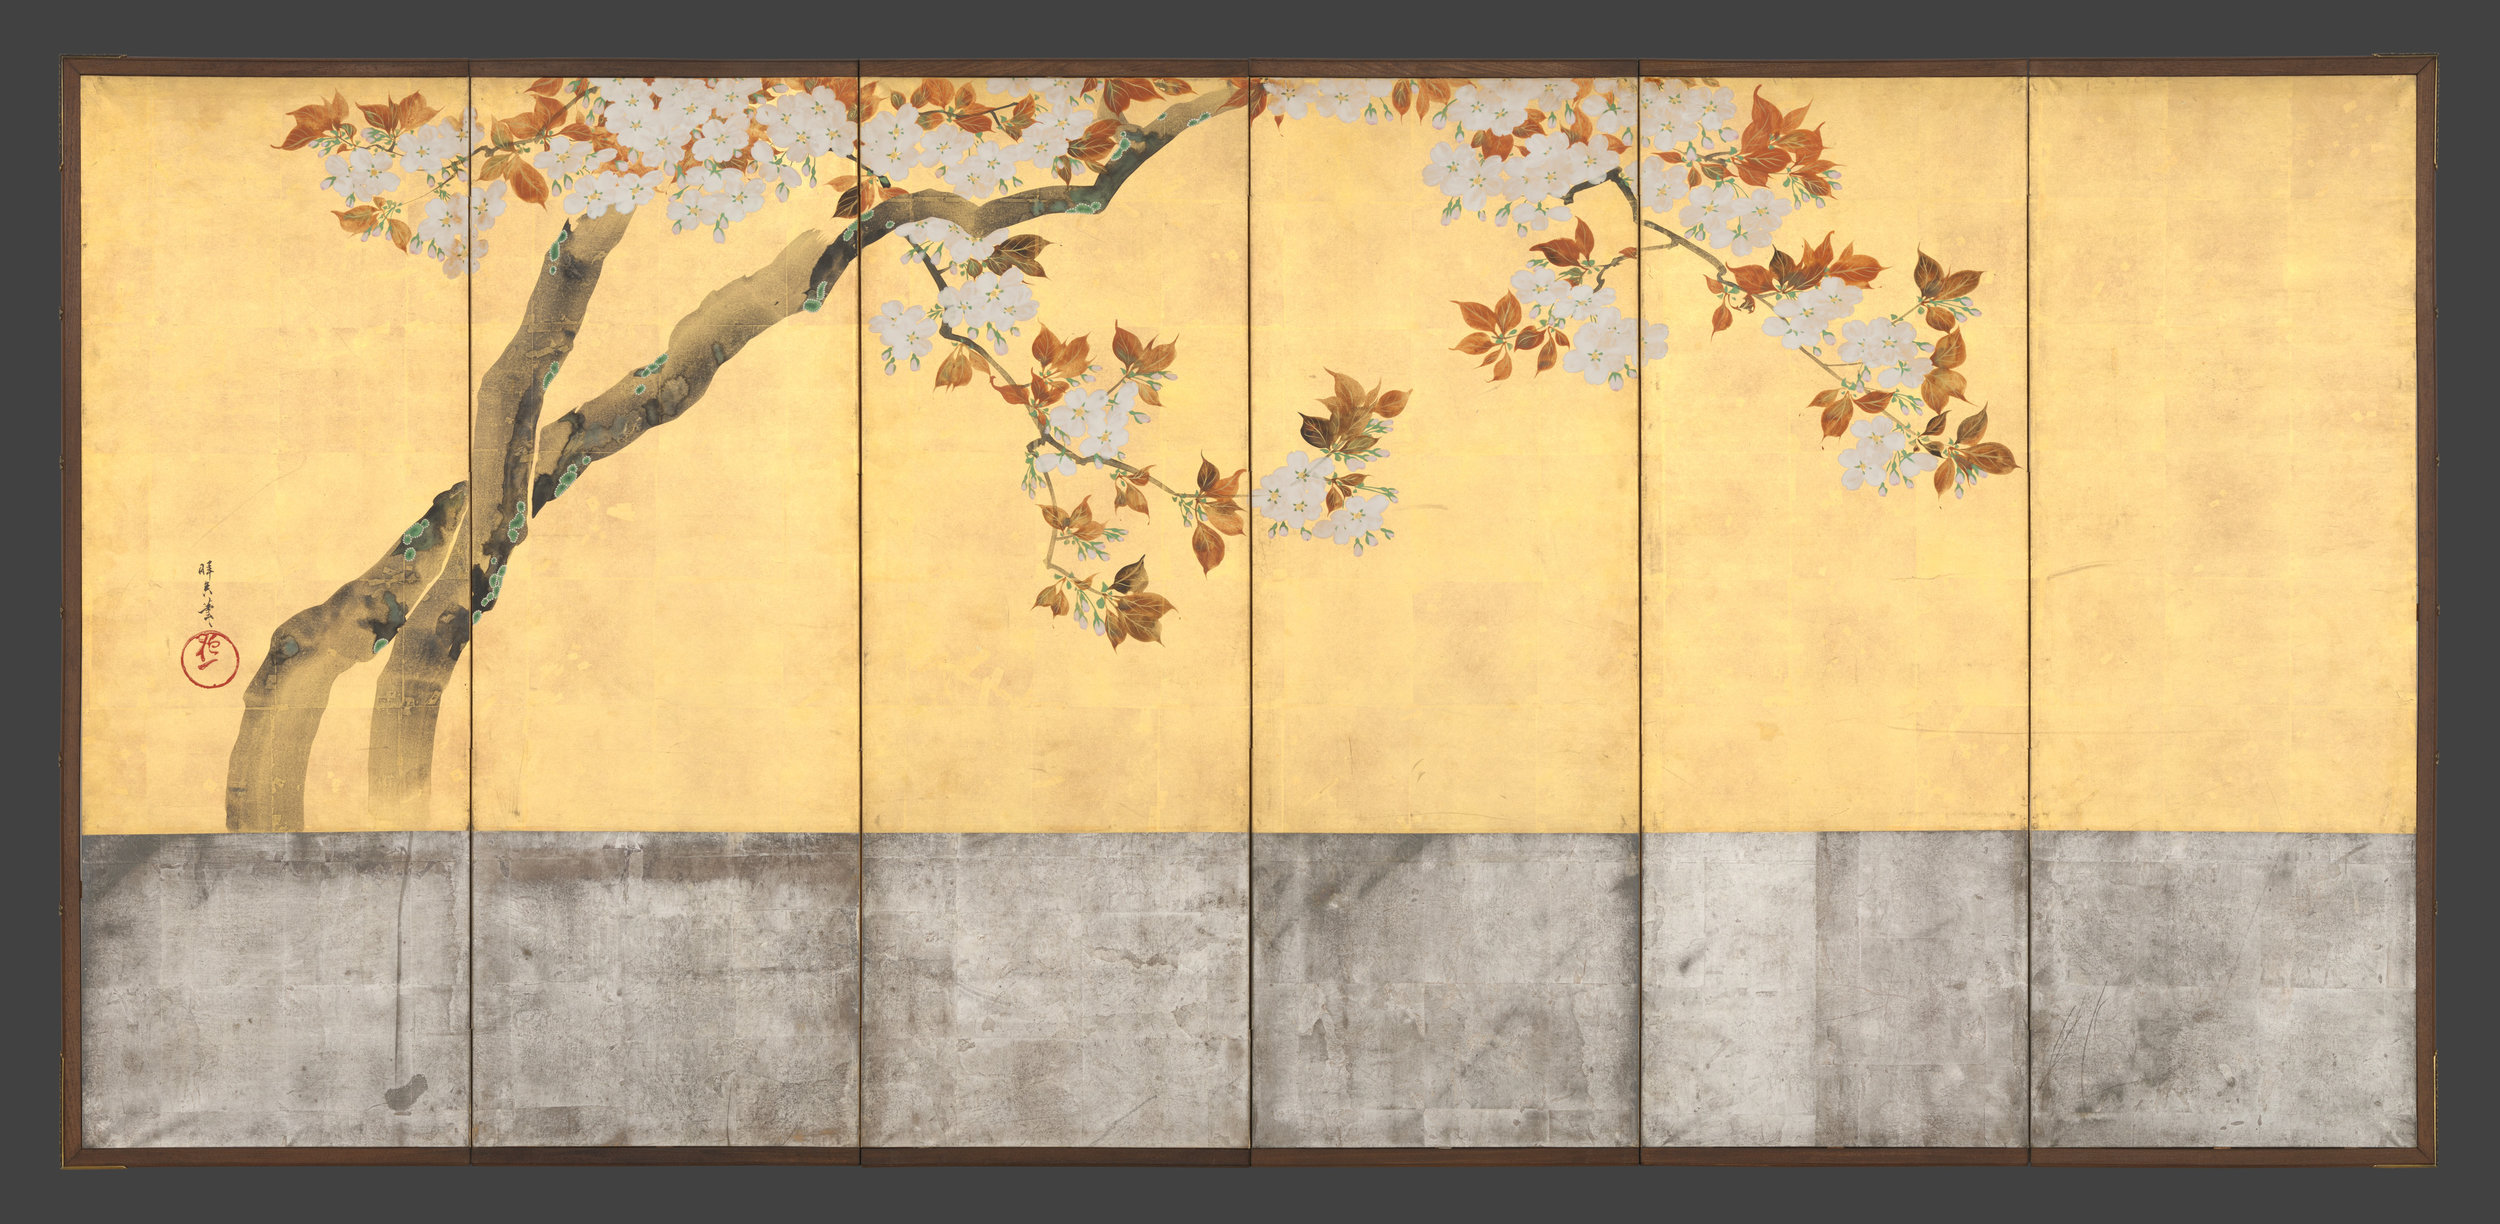 Blossoming Cherry Trees, ca. 1805  Sakai Hōitsu CREDIT: Metropolitan Museum of Art